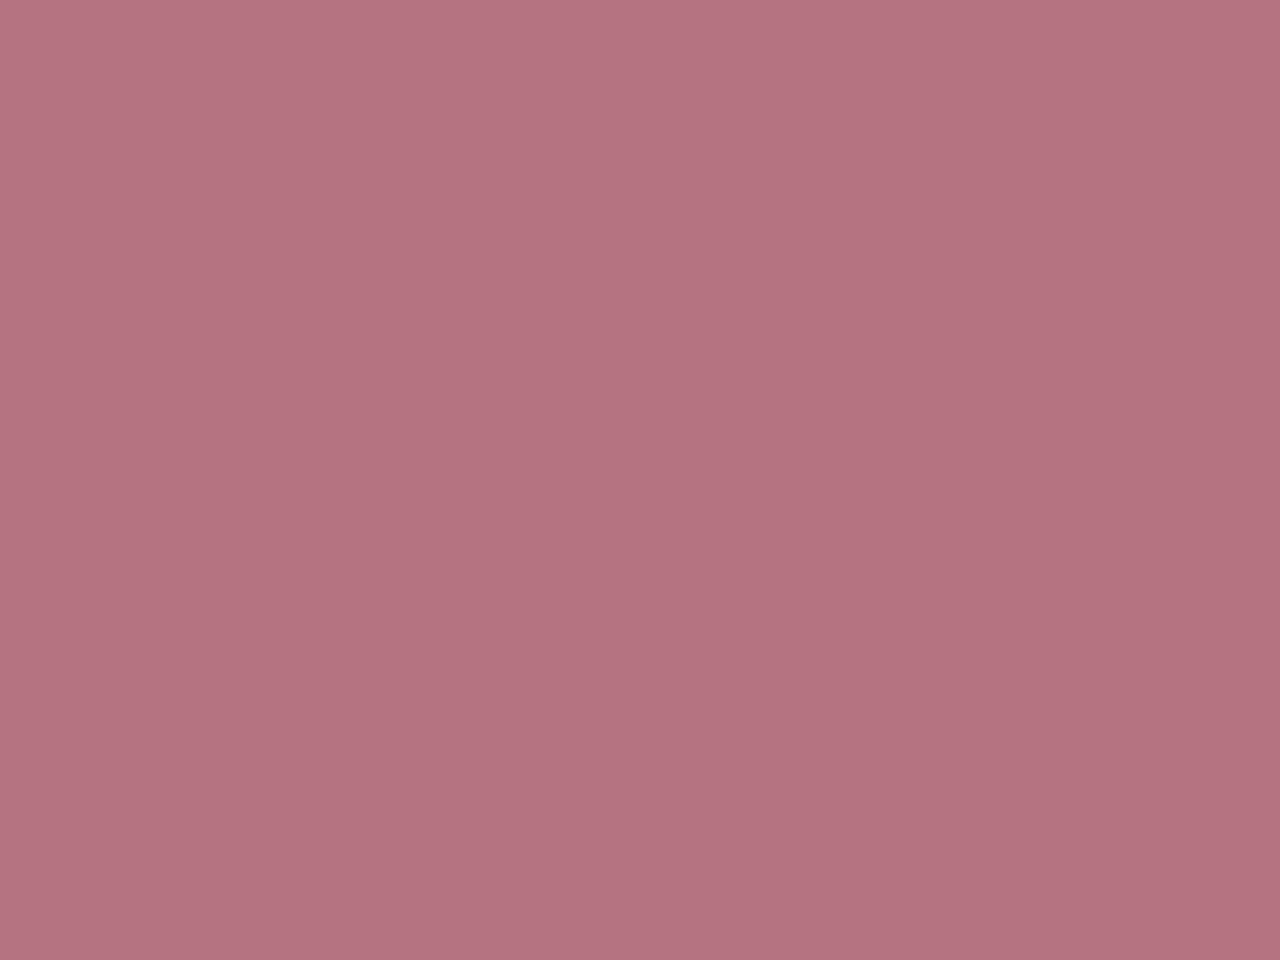 1280x960 Turkish Rose Solid Color Background